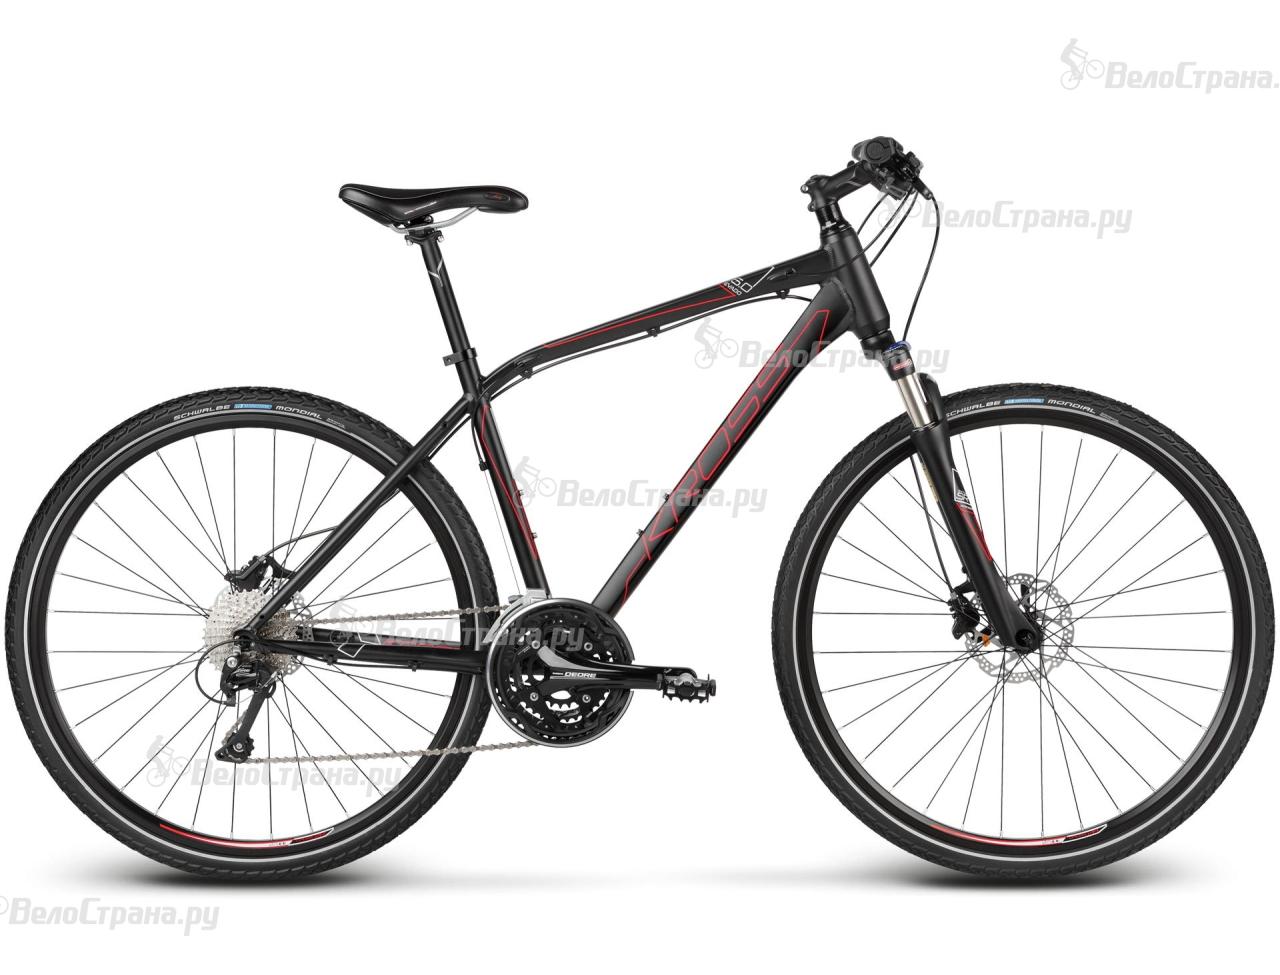 Велосипед Kross Evado 6.0 (2017) велосипед kross evado 1 0 lady 2017